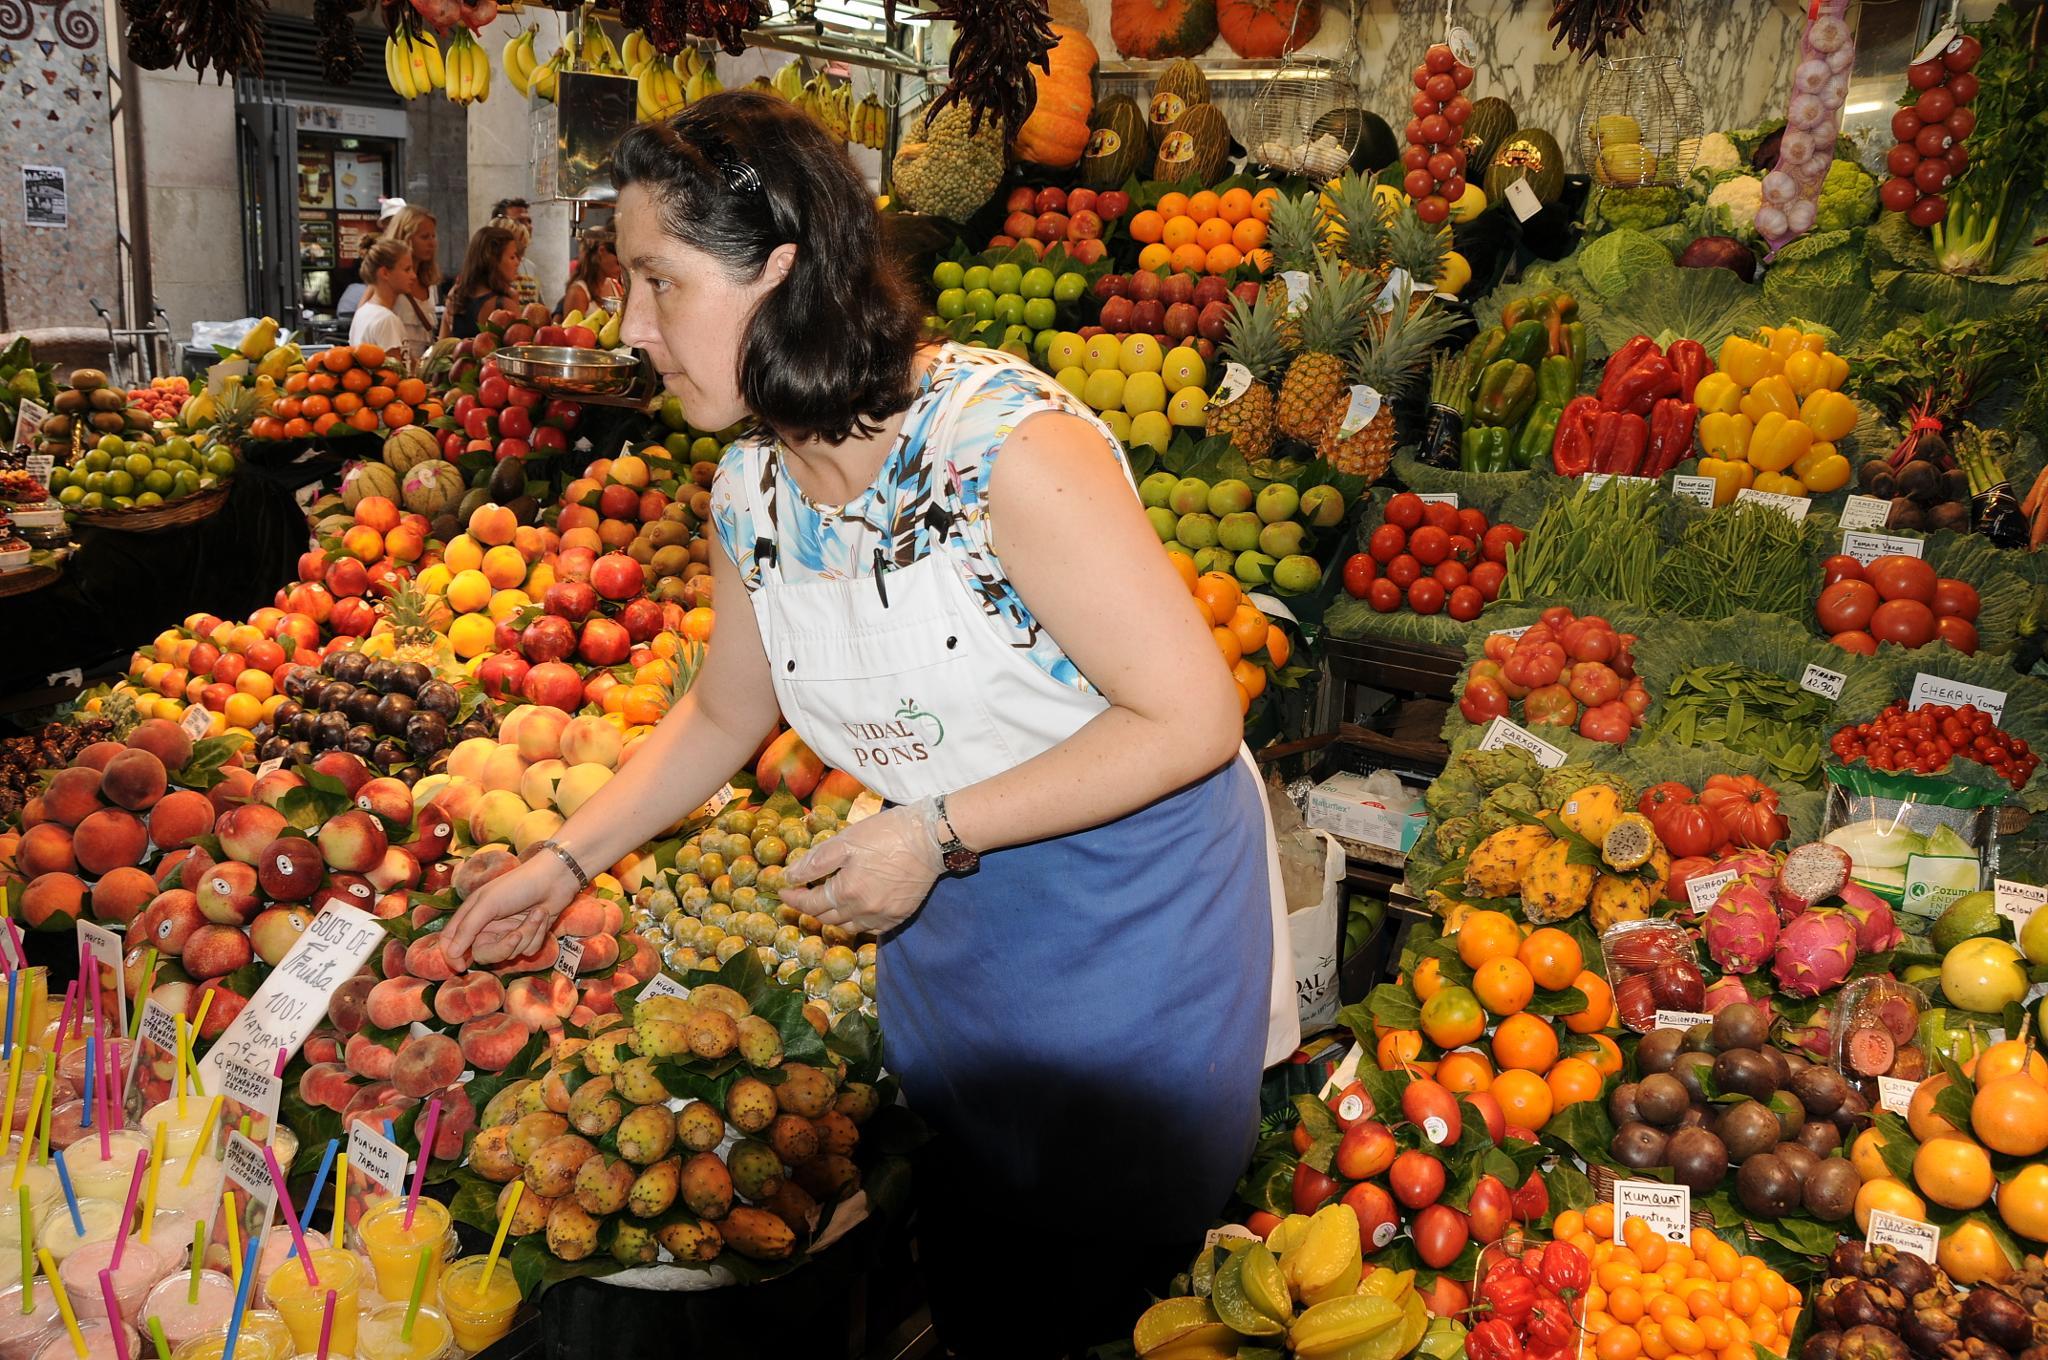 Fruit Vendor La Boqueria Barcelona by Serge Kay